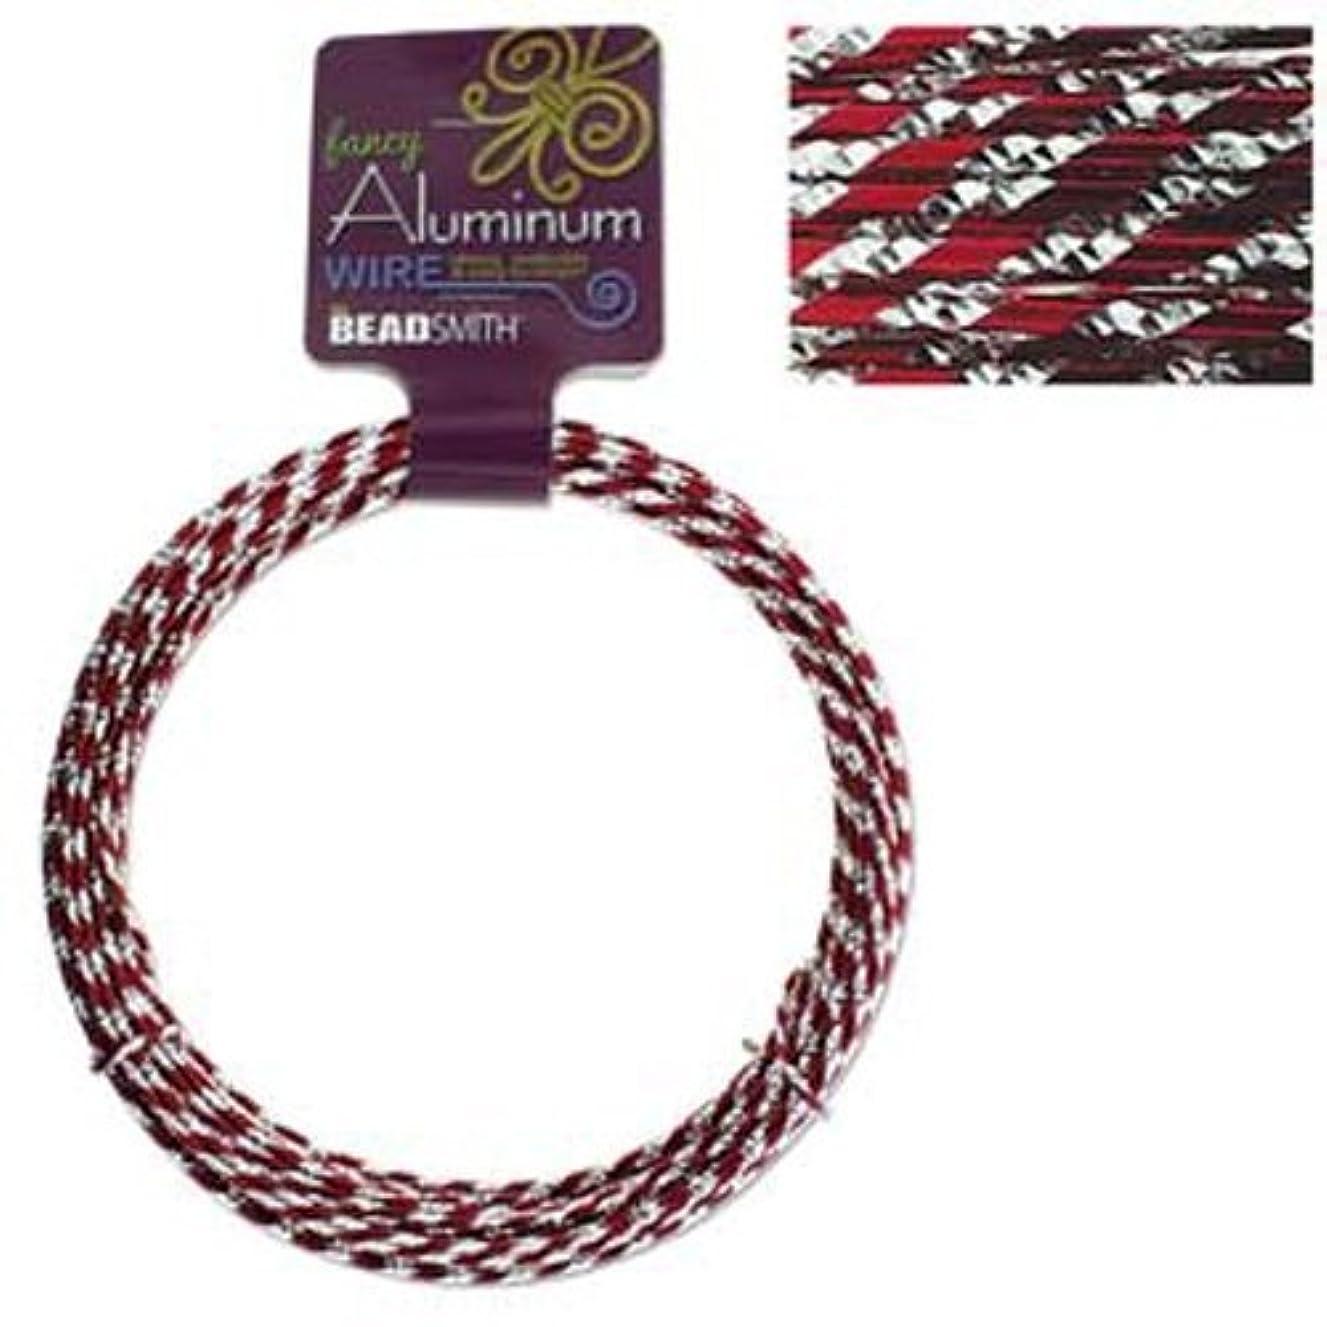 Fancy Aluminum Craft Wire 12 Gauge 39 Feet Diamond Cut Red & Silver